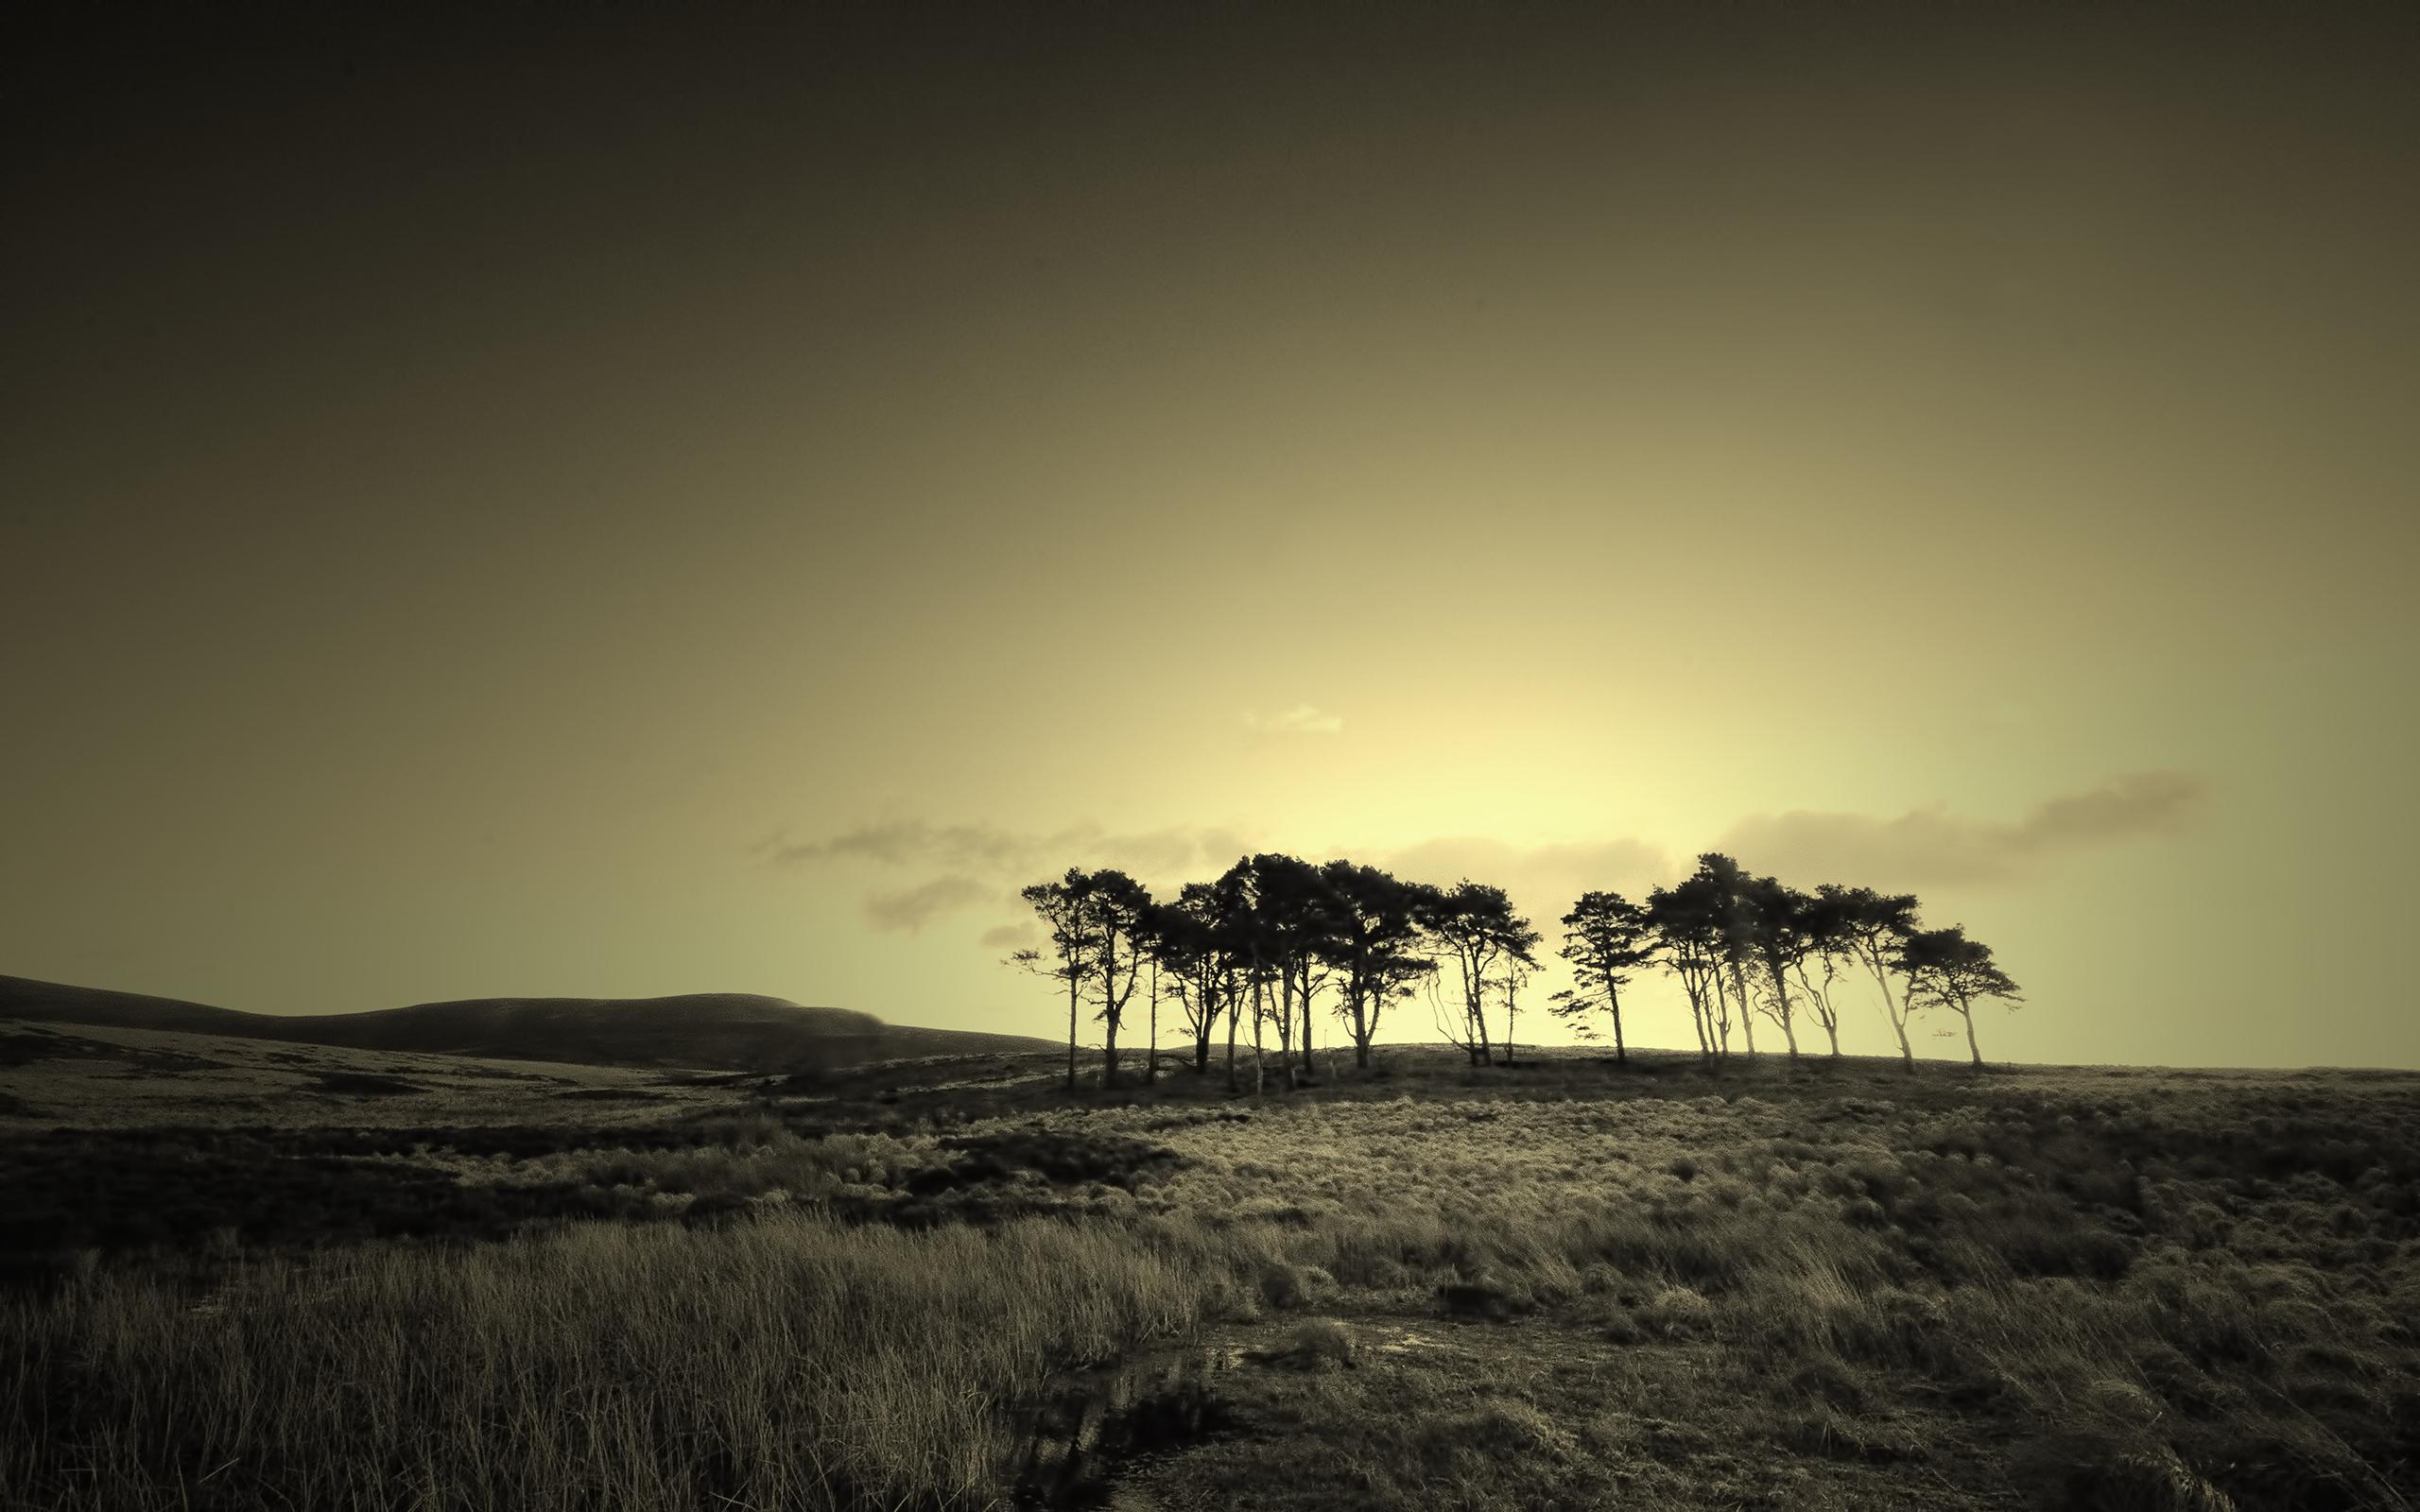 Isolated landscape